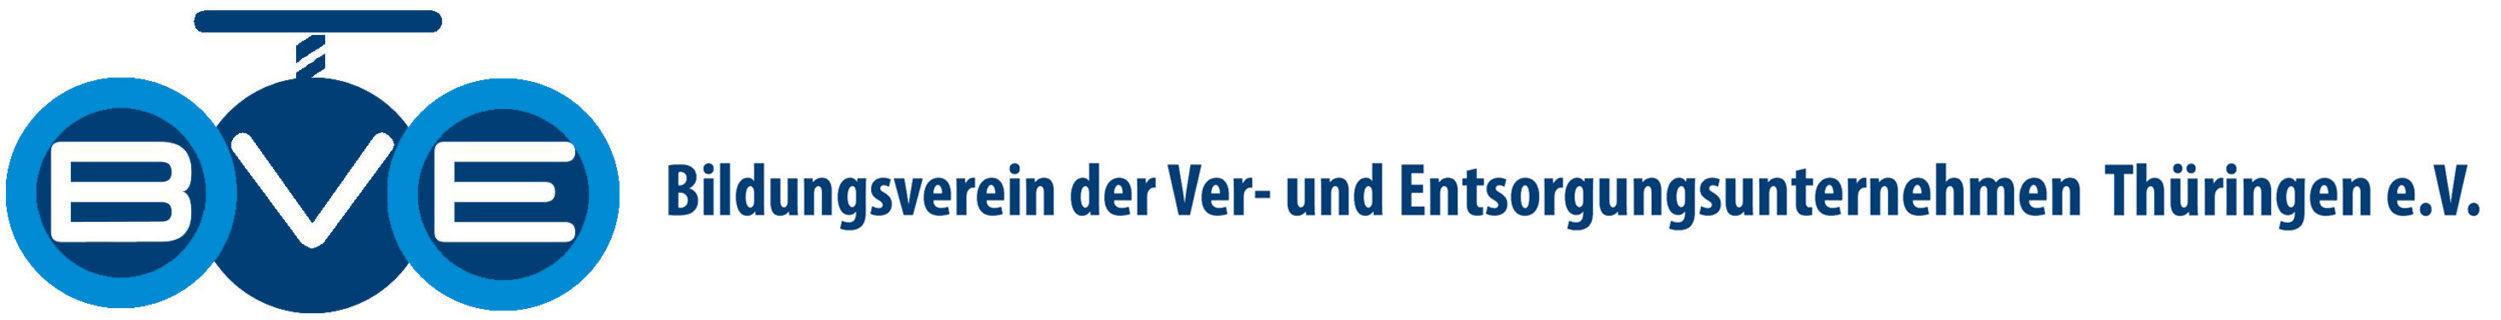 bve-umweltberufe.de